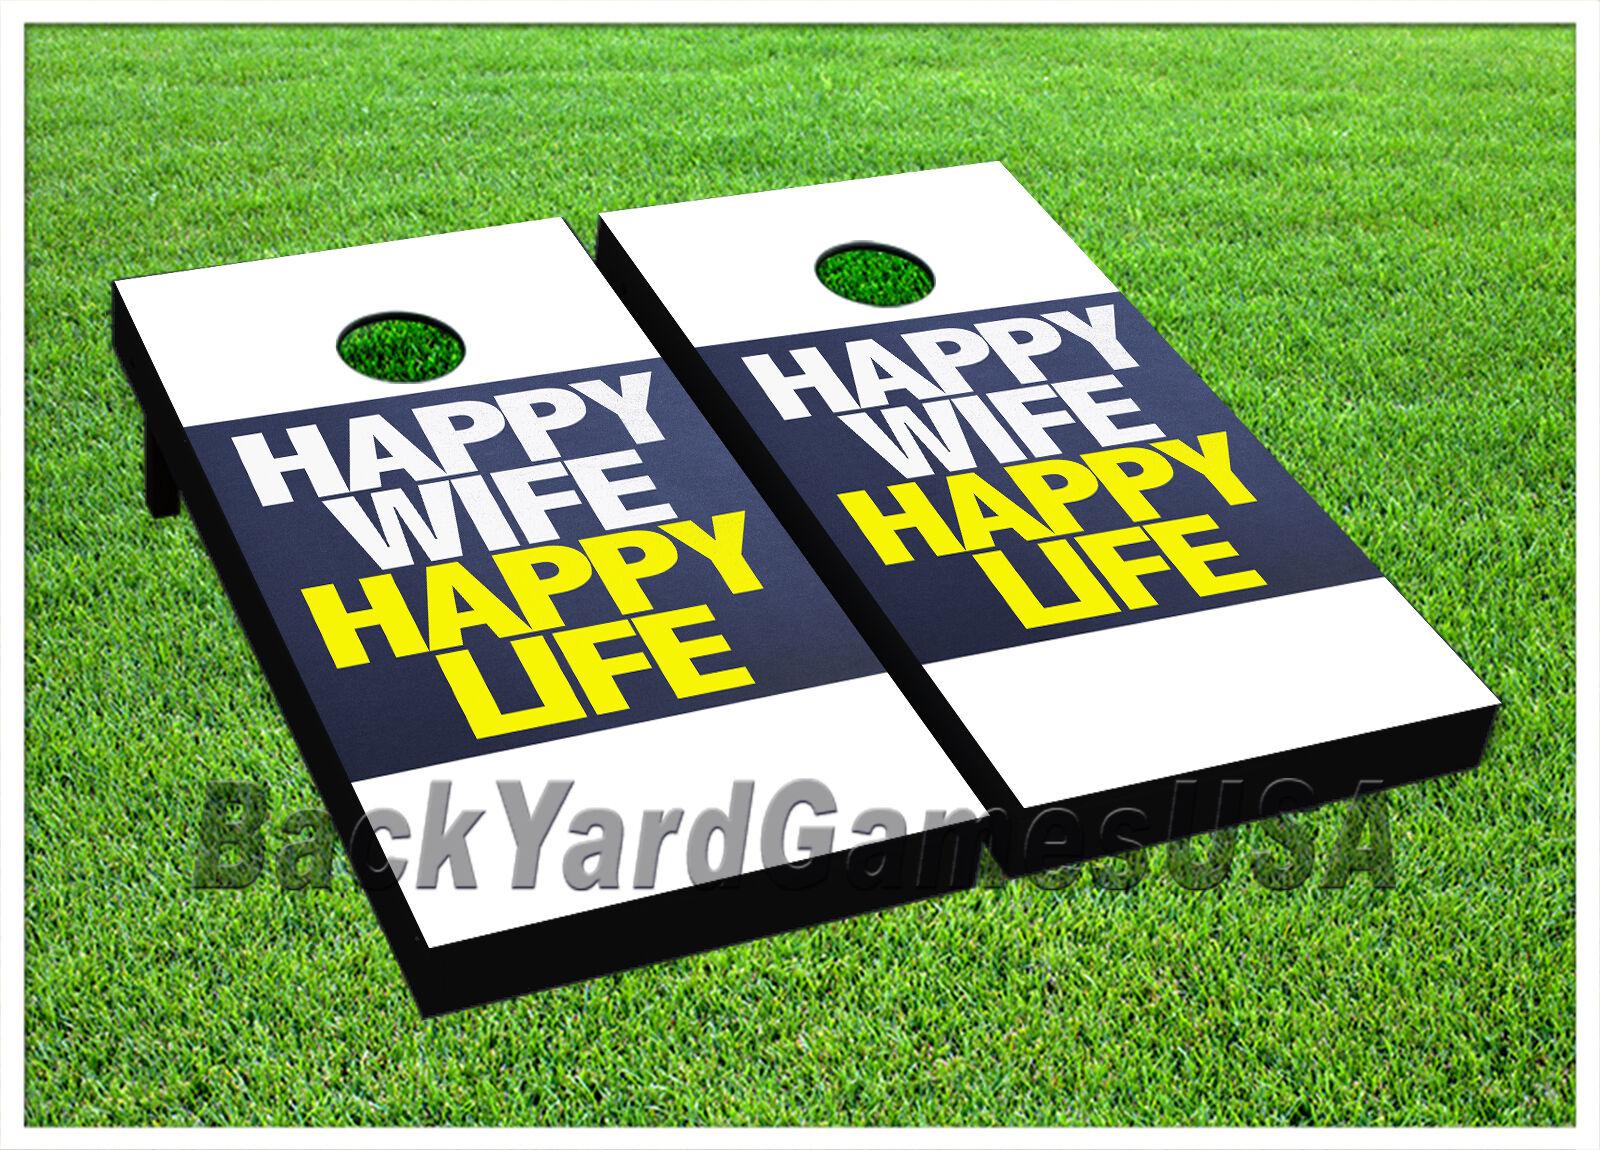 Cornhole Boards BEANTasche TOSS GAME Happy Wife Happy Life Blau Gelb Tasches Set